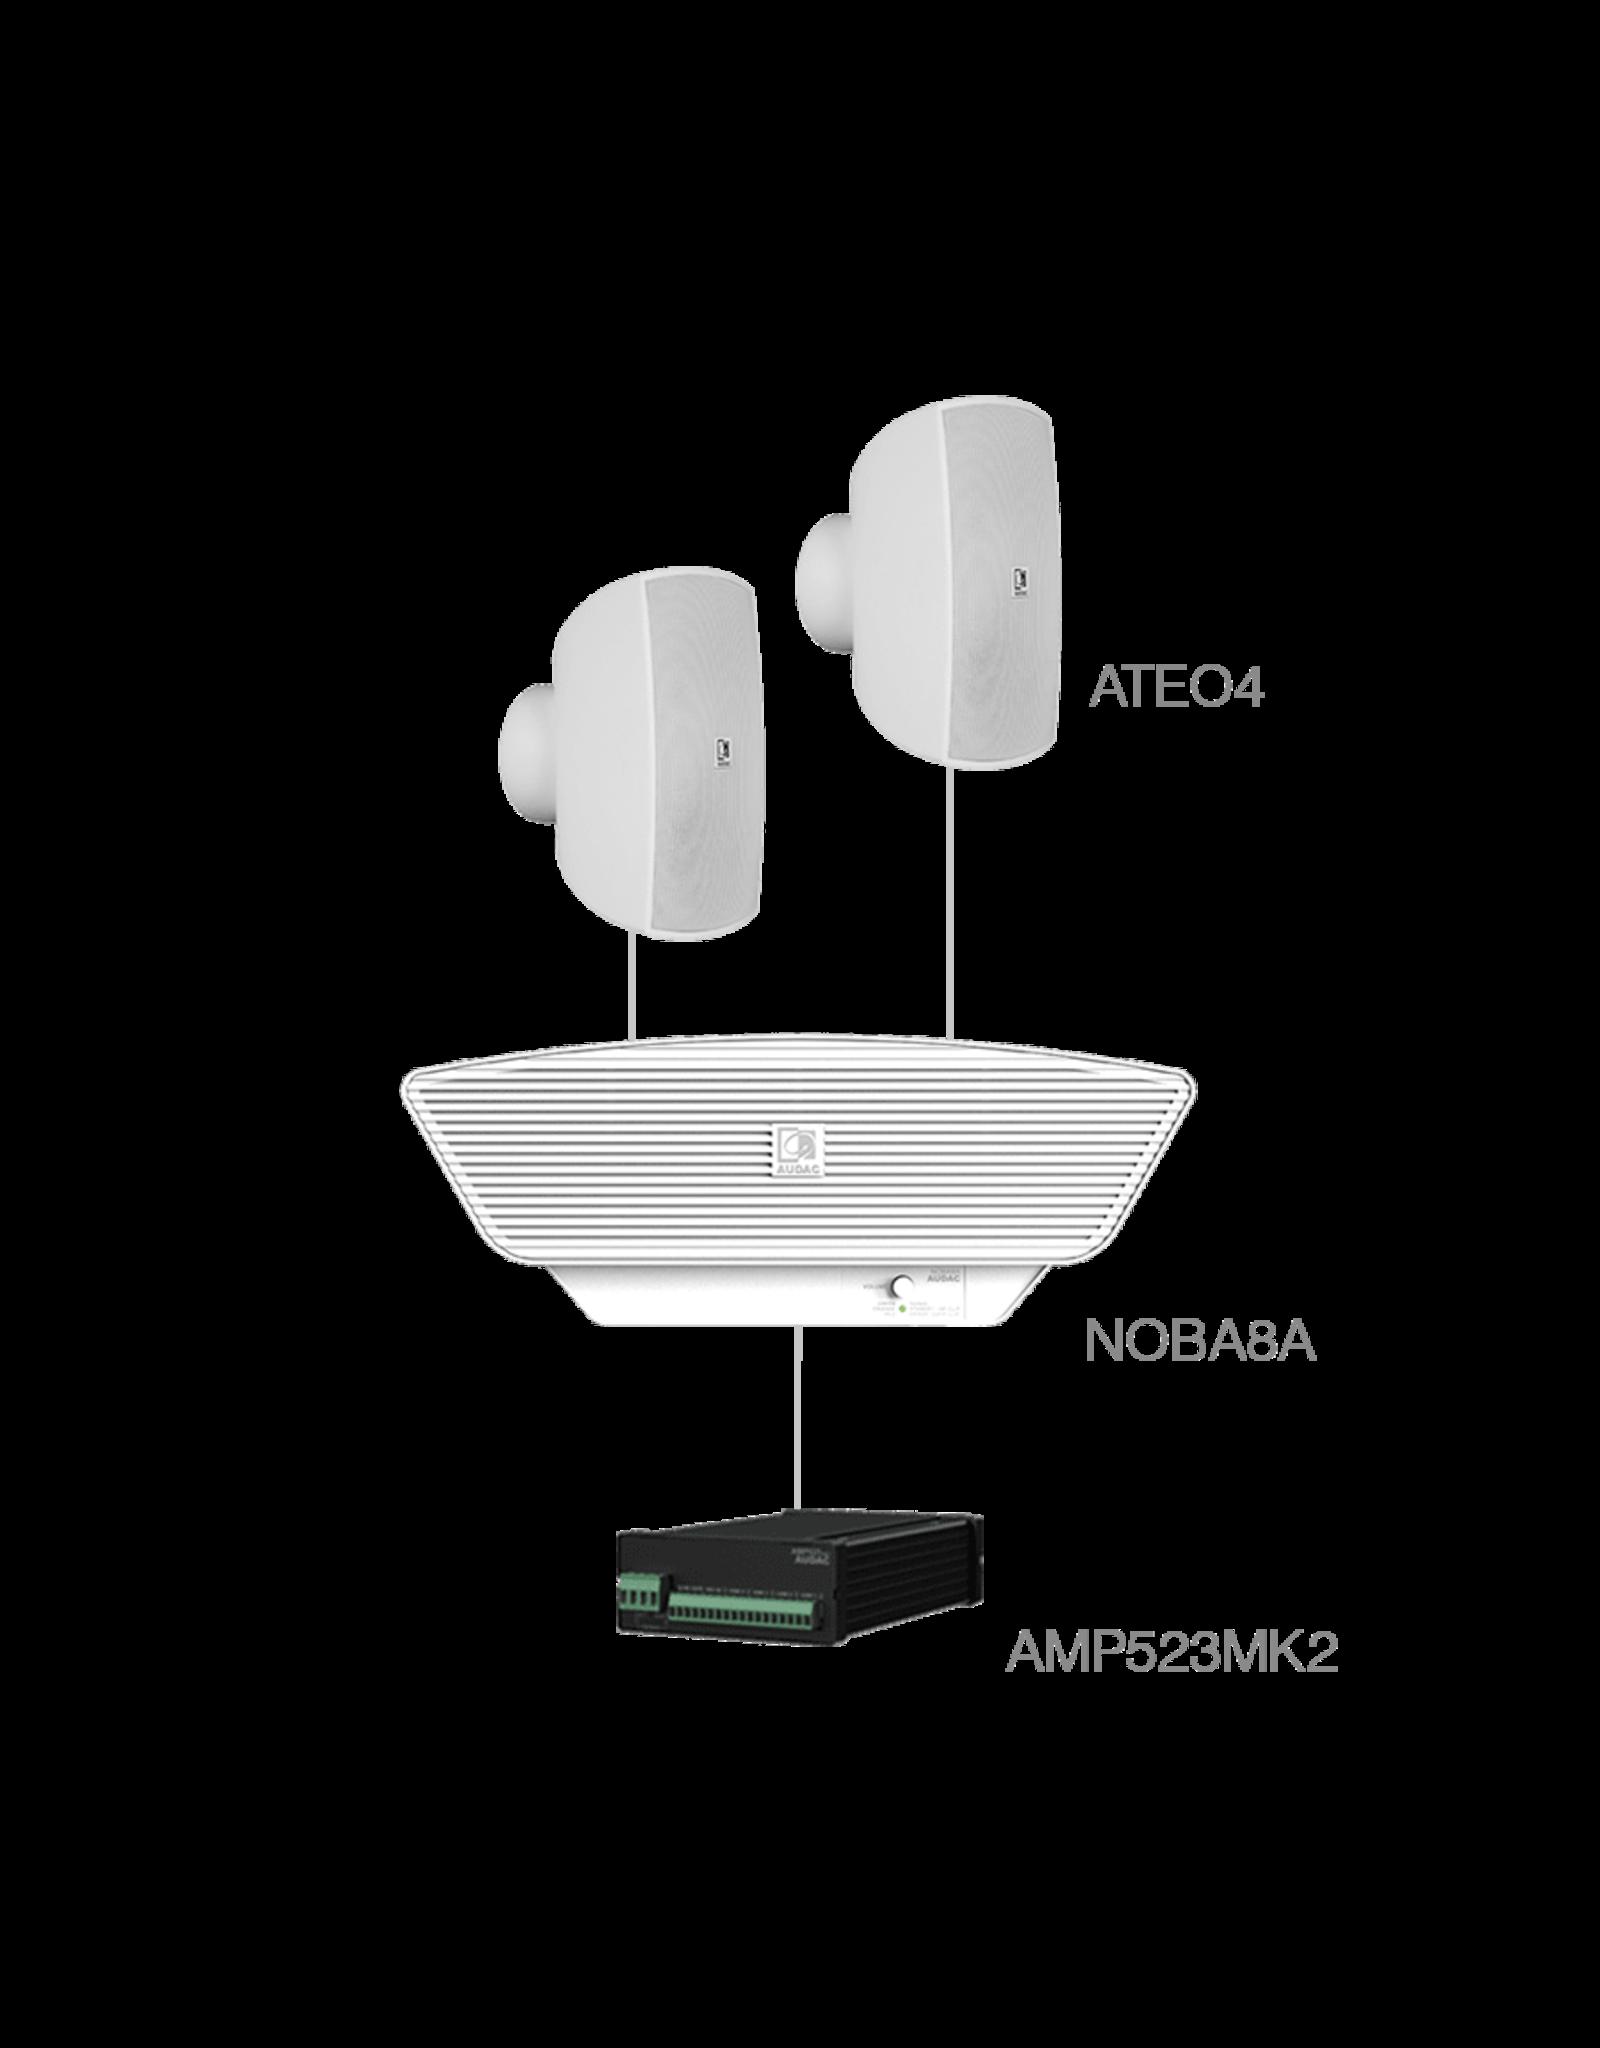 Audac 2 x ATEO4 + NOBA8A + AMP523MK2 White